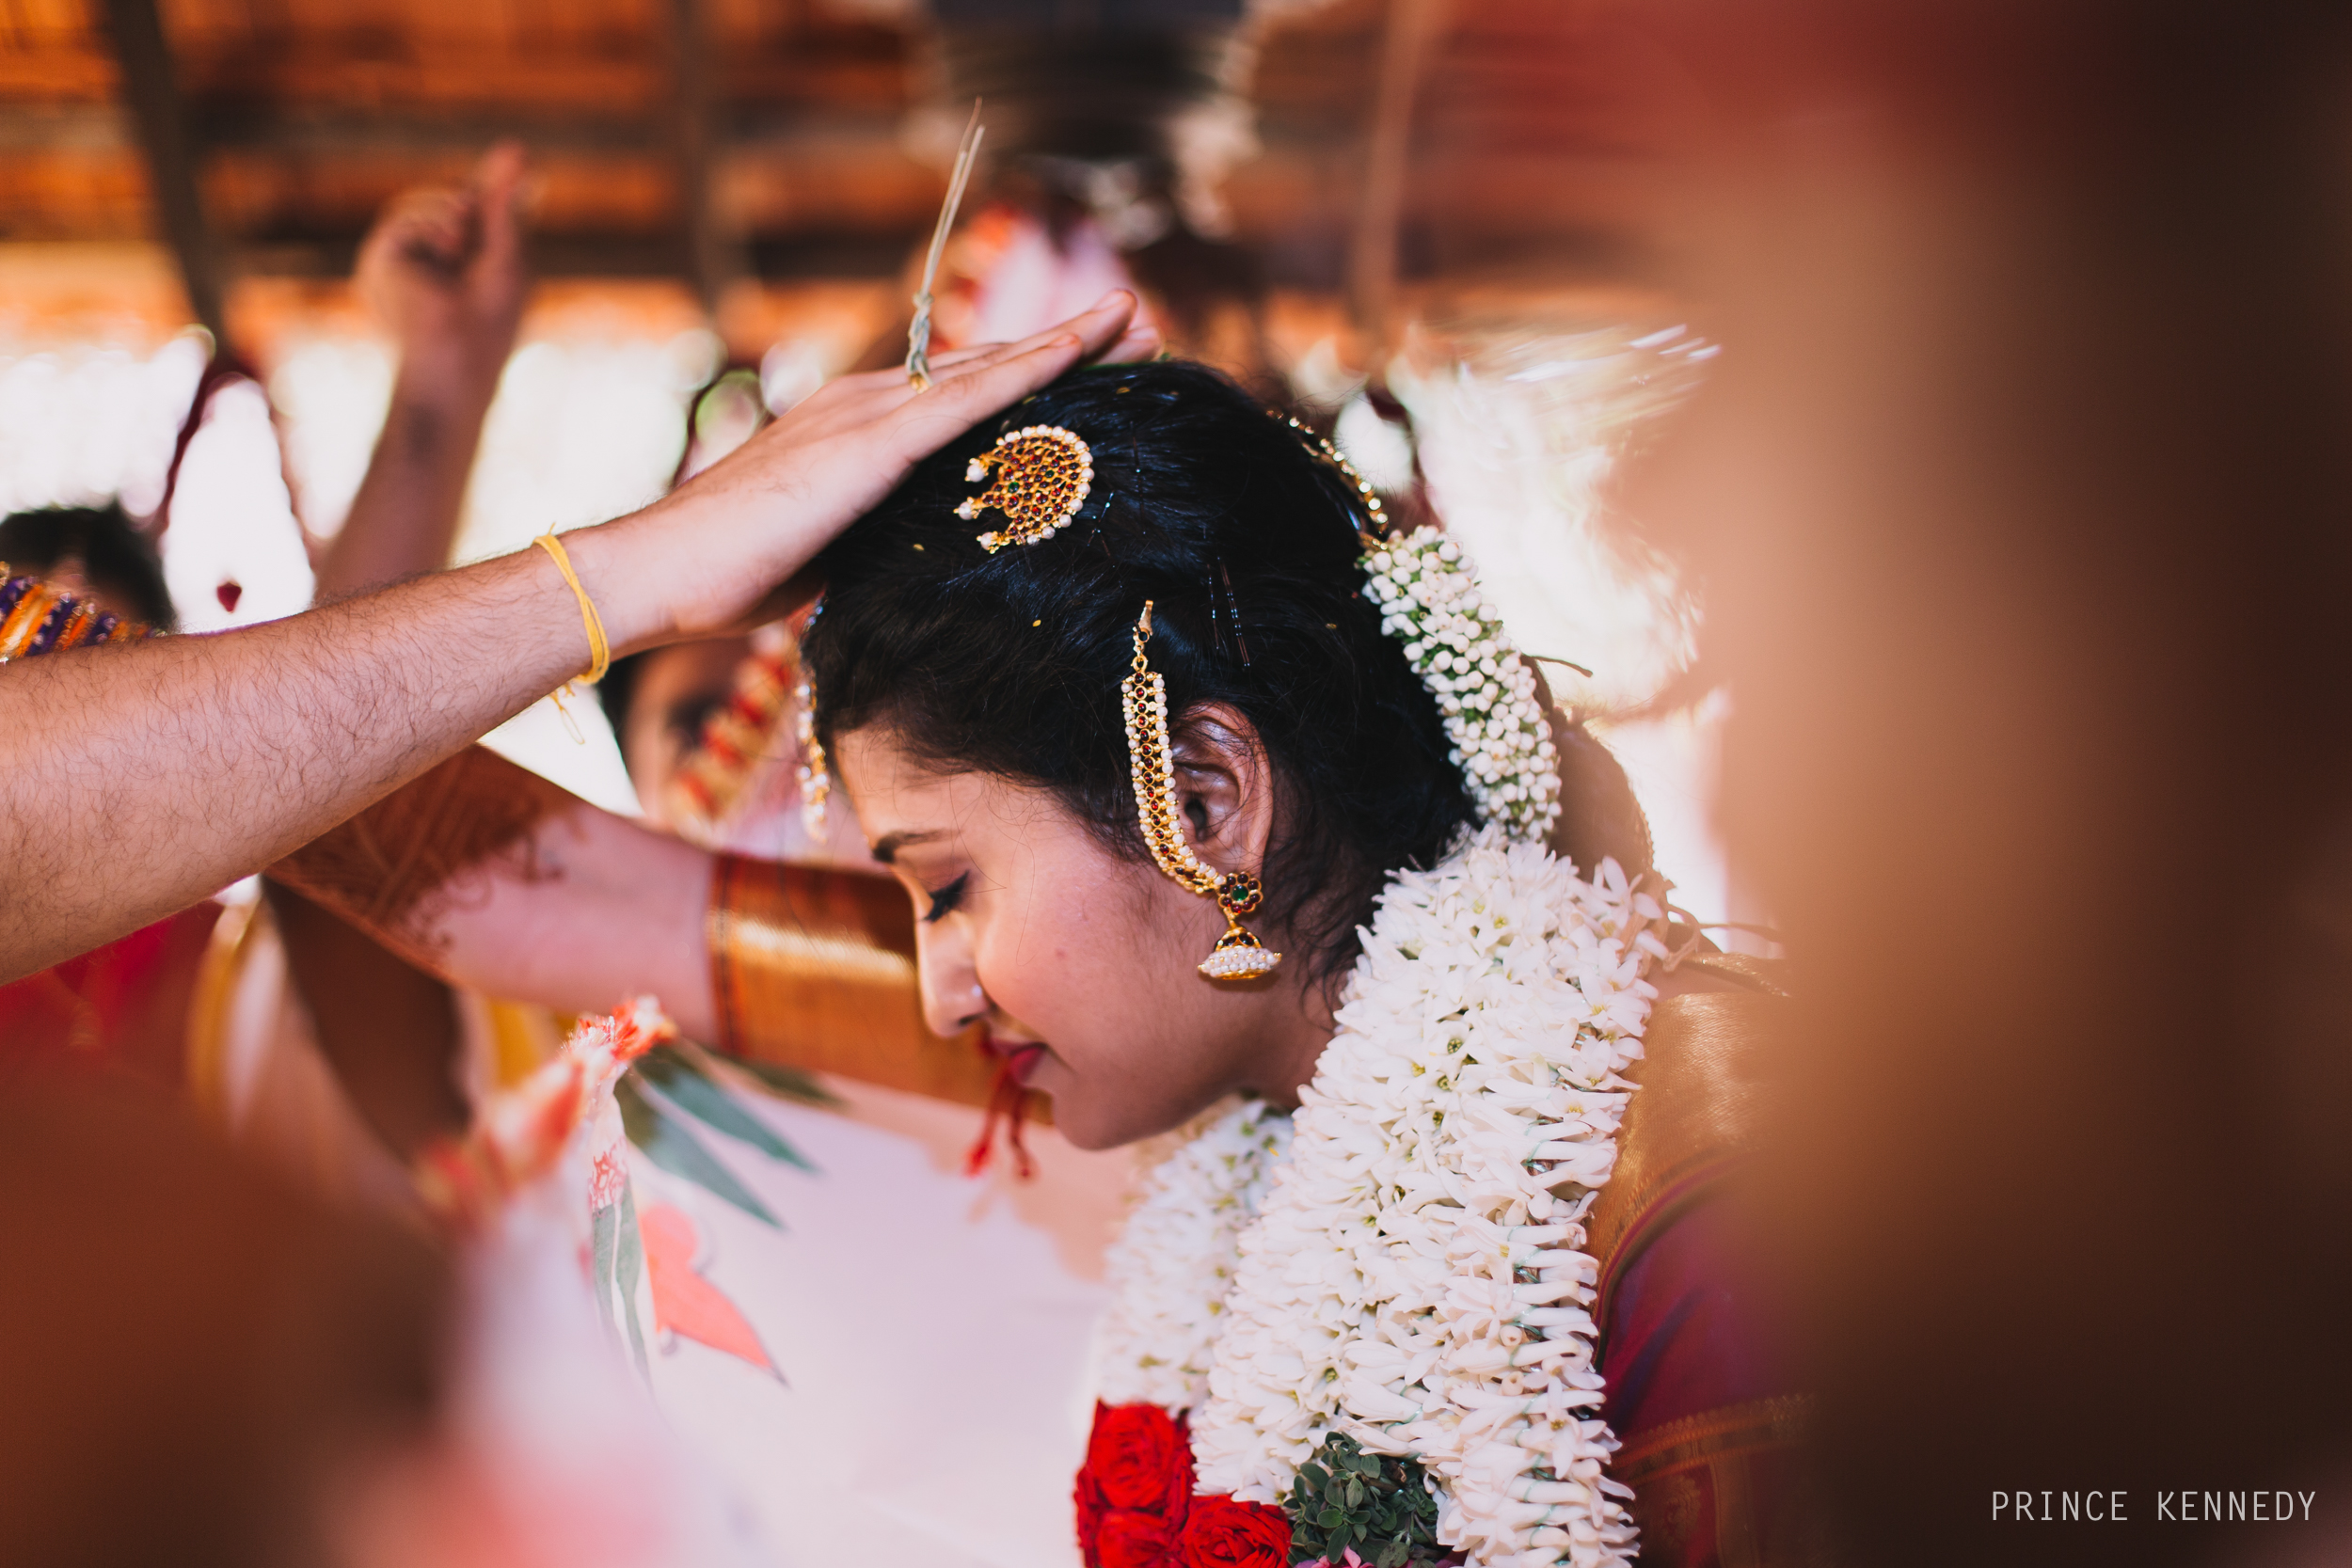 Athmajja-Nithesh-Engagement-Couple-Portrait-Portraiture-Wedding-Couple-Portrait-Chennai-Photographer-Candid-Photography-Destination-Best-Prince-Kennedy-Photography-242.jpg